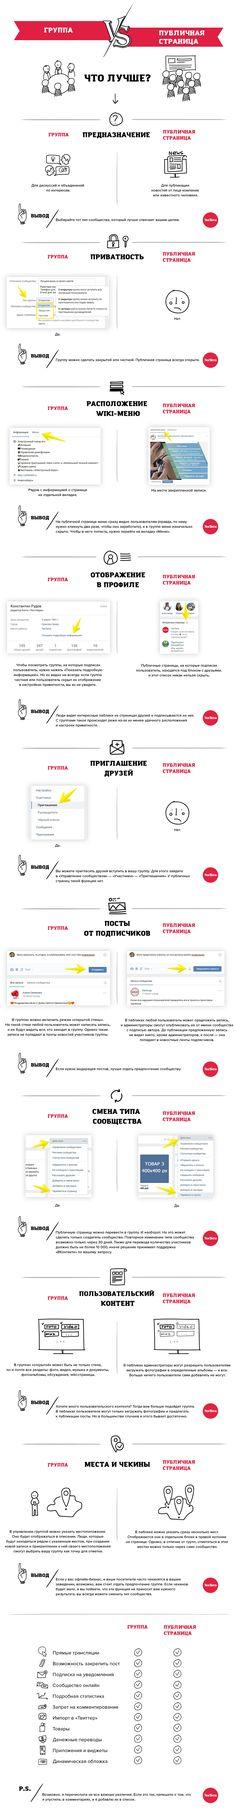 Content Marketing, Map, Maps, Inbound Marketing, Peta